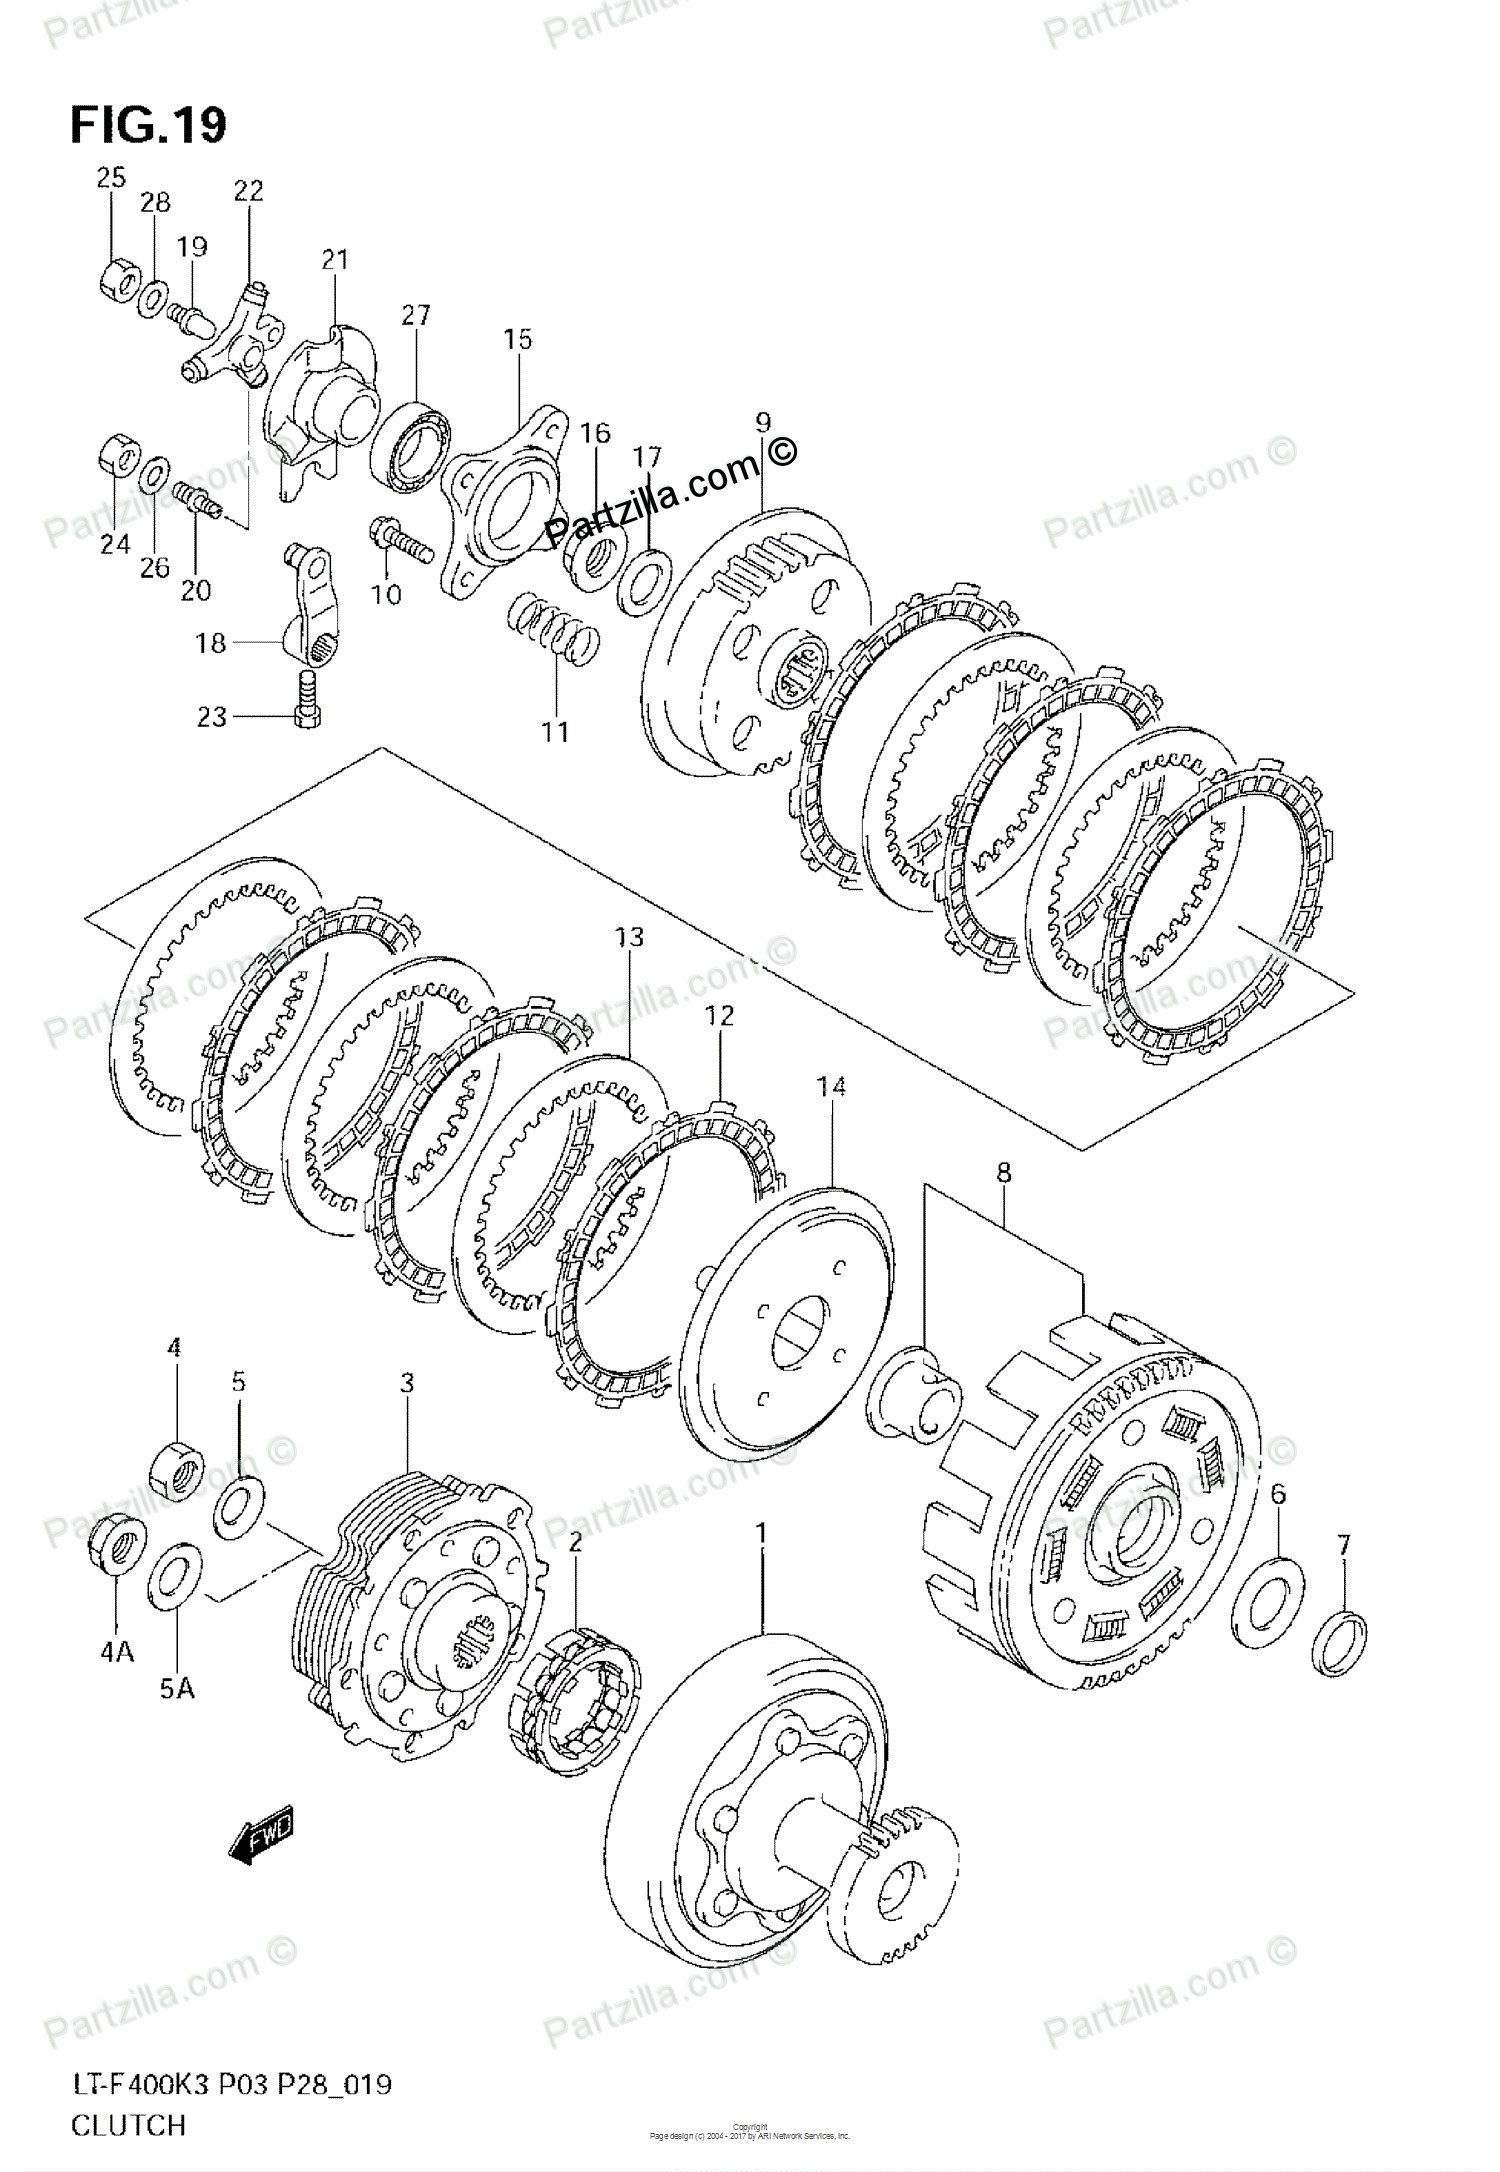 1964 lincoln continental wiring diagram wiring library Ford Vacuum Diagrams F 250 clutch parts diagram suzuki atv 2004 oem parts diagram for clutch model k3 partzilla of clutch